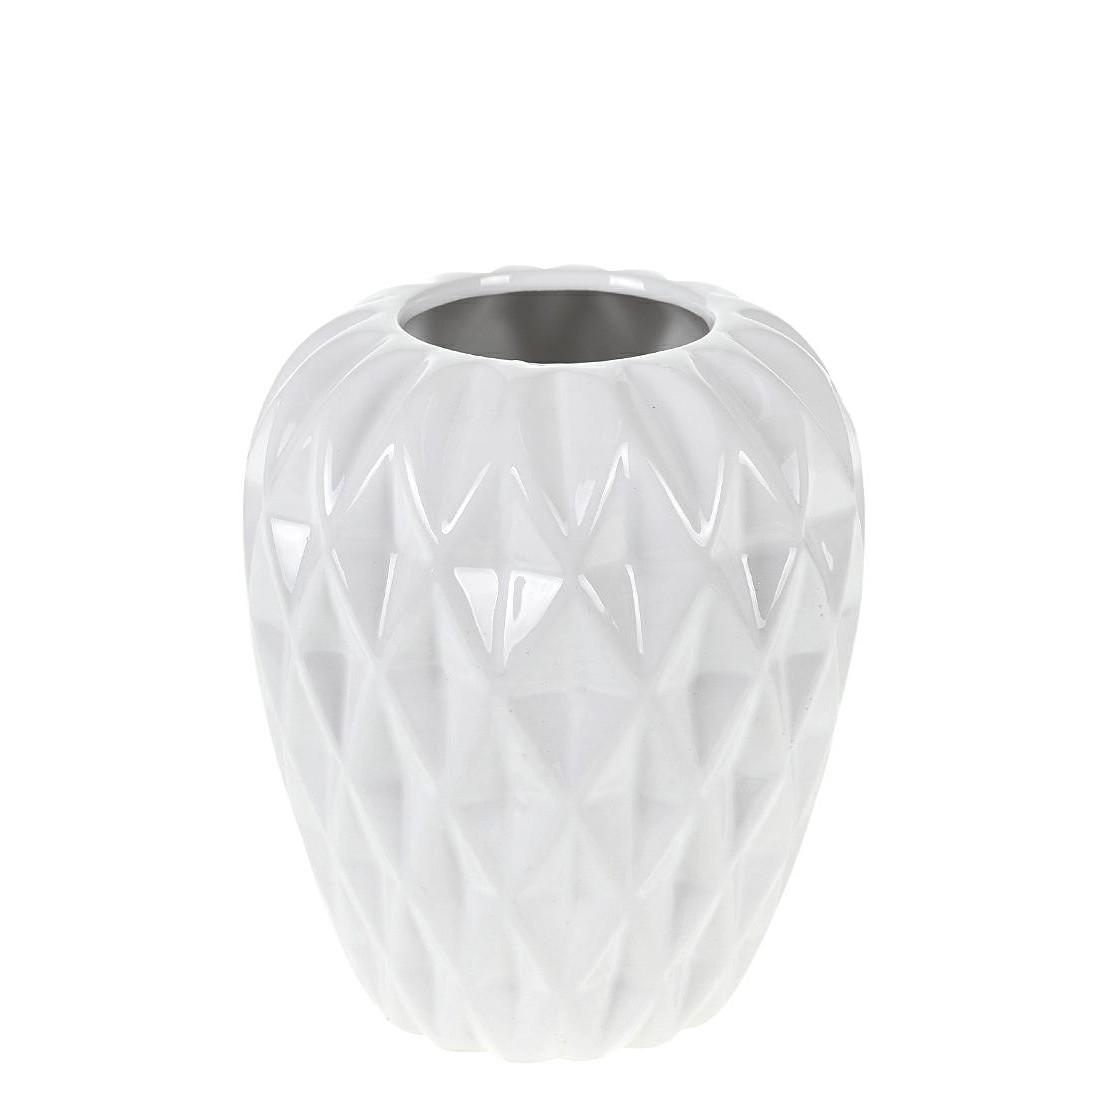 Vaso Decorativo de Ceramica Redondo 15cm Branco